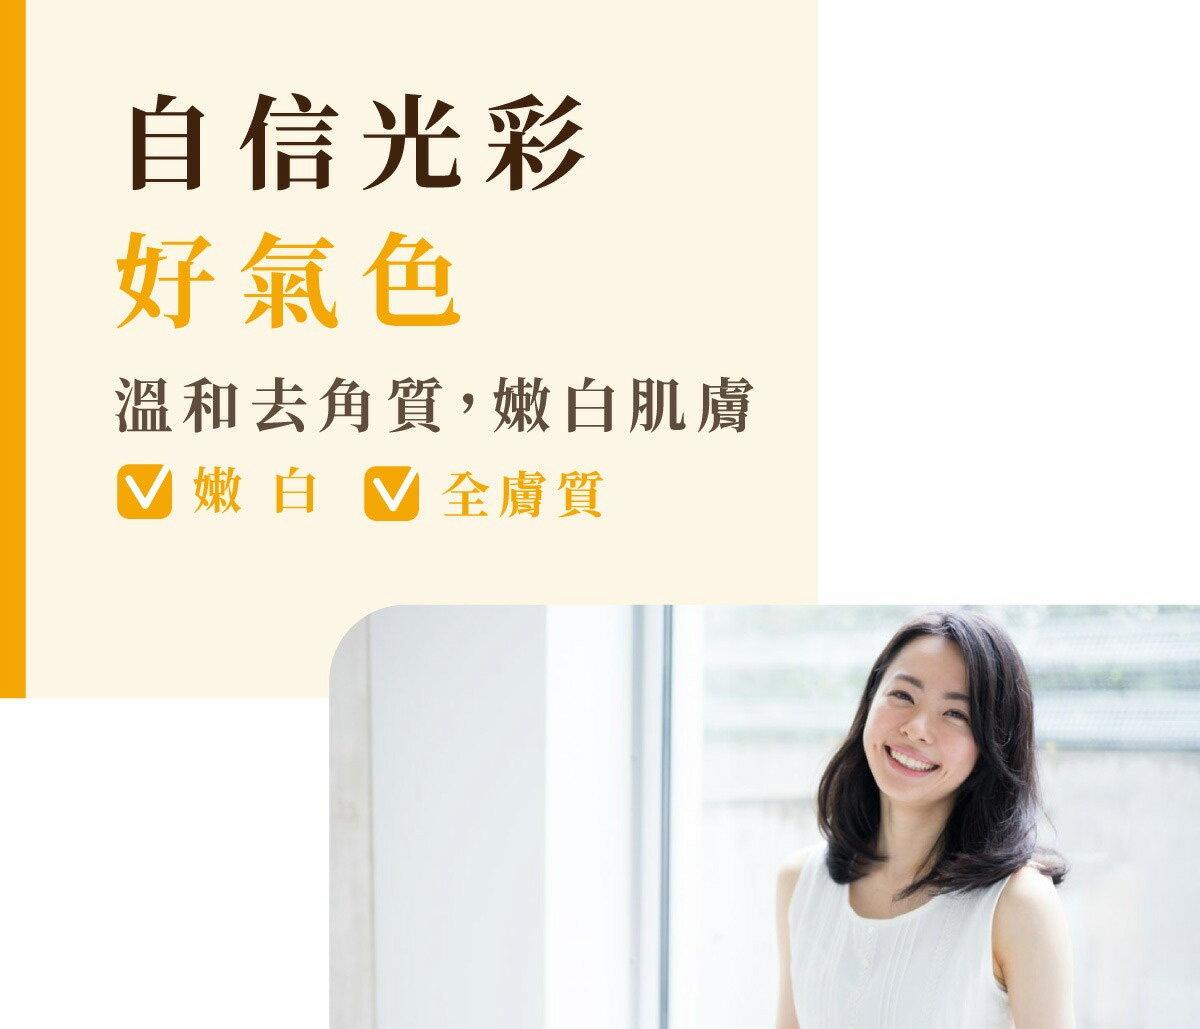 MIT👍滿額贈♥️【Inna Organic 童顏有機】橙花光采嫩白隱形面膜 (1片) 2